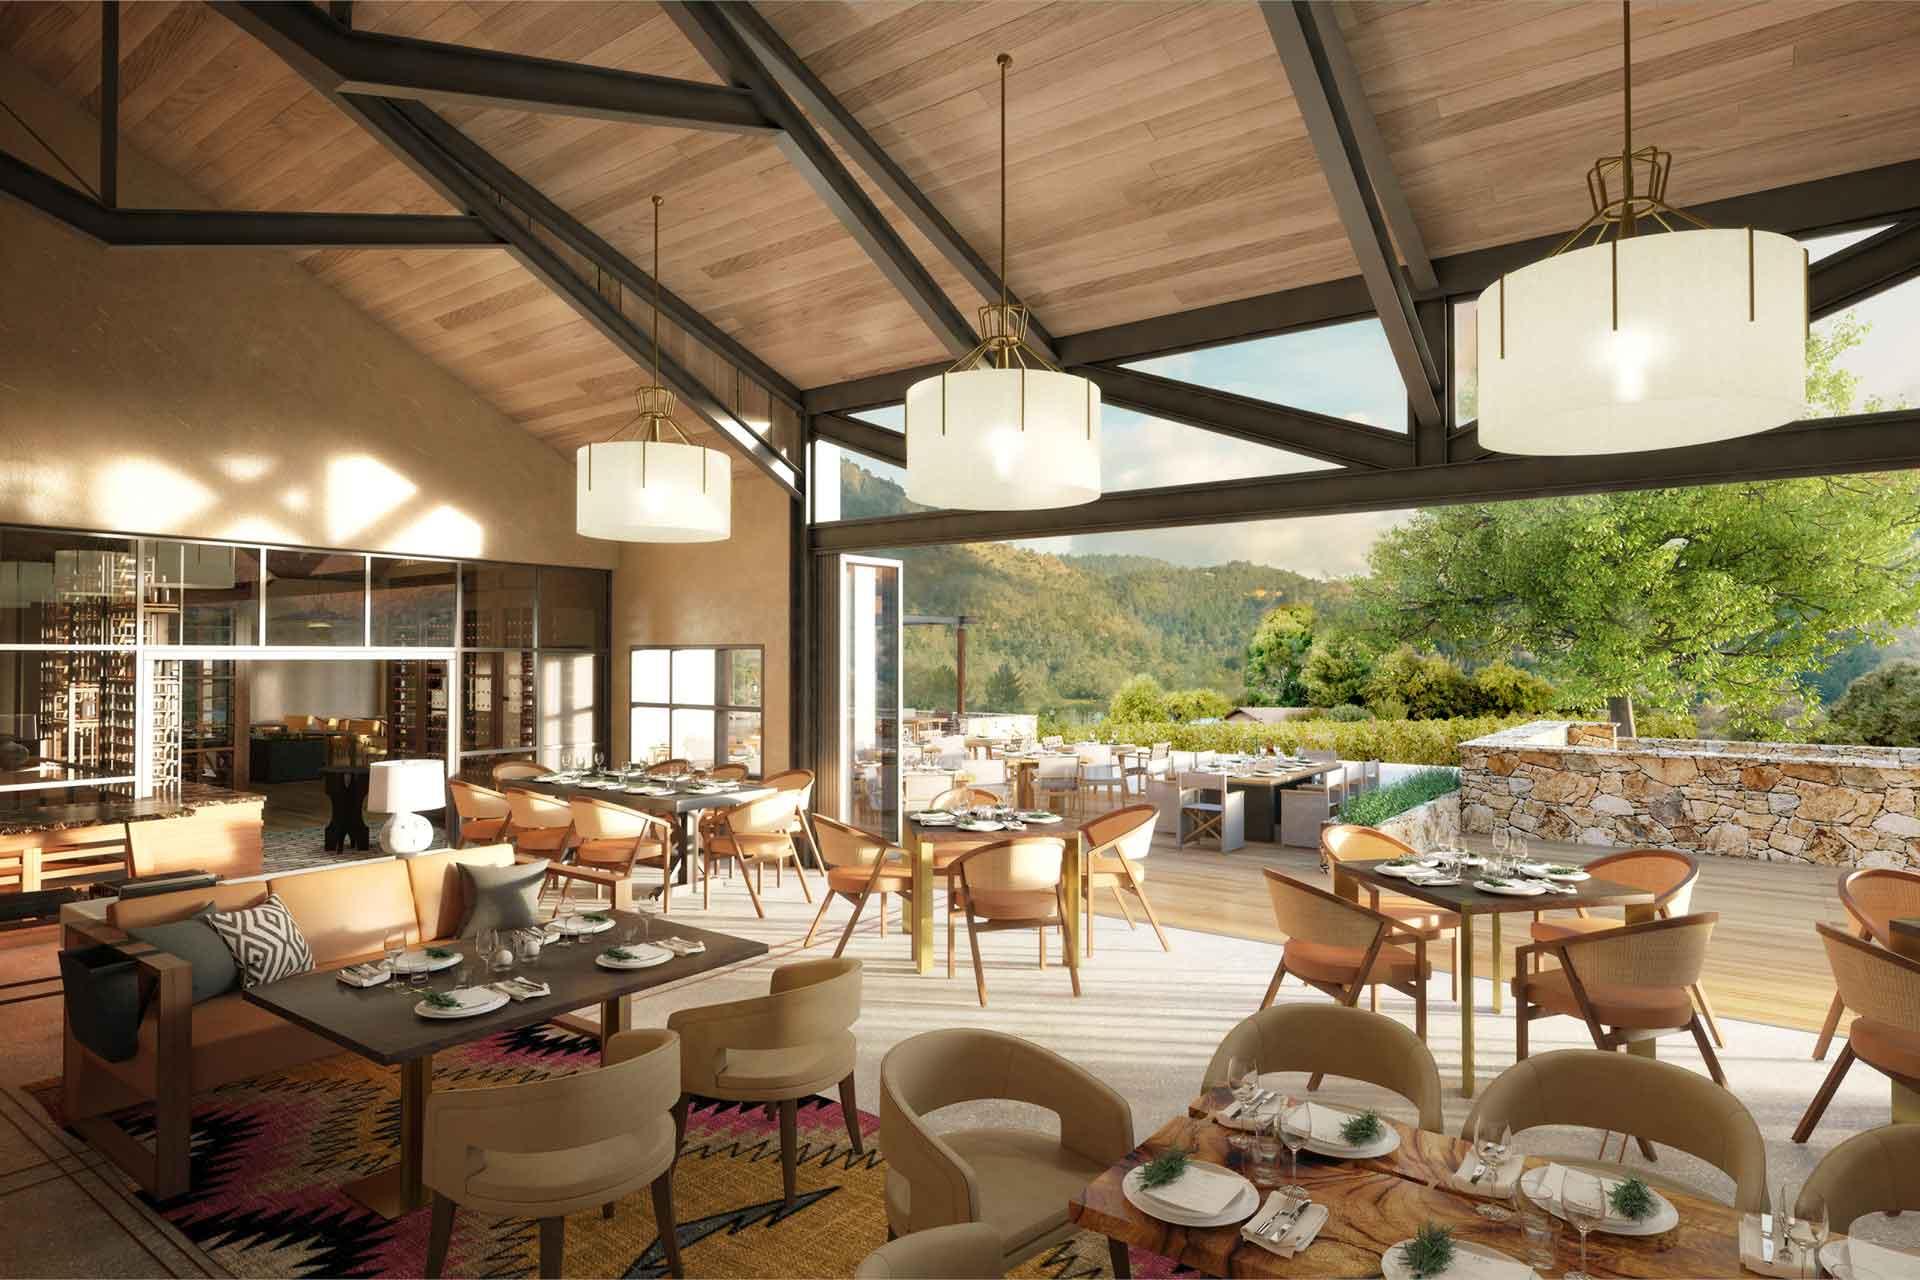 Four Seasons Resort & Residences in Napa Valley